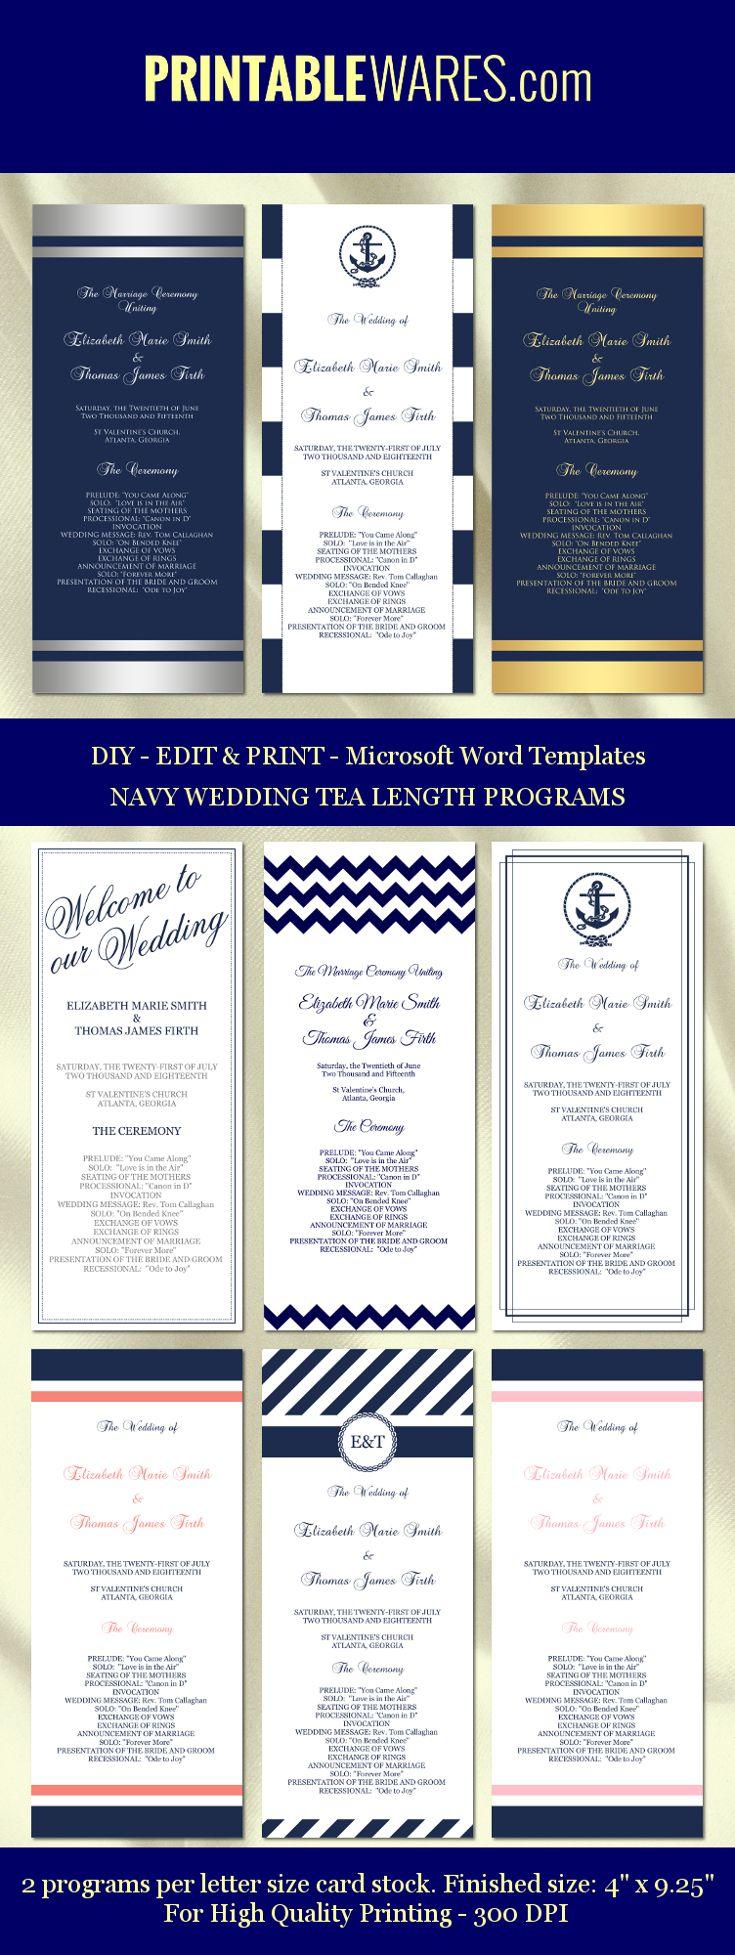 diy printable wedding program templates navy